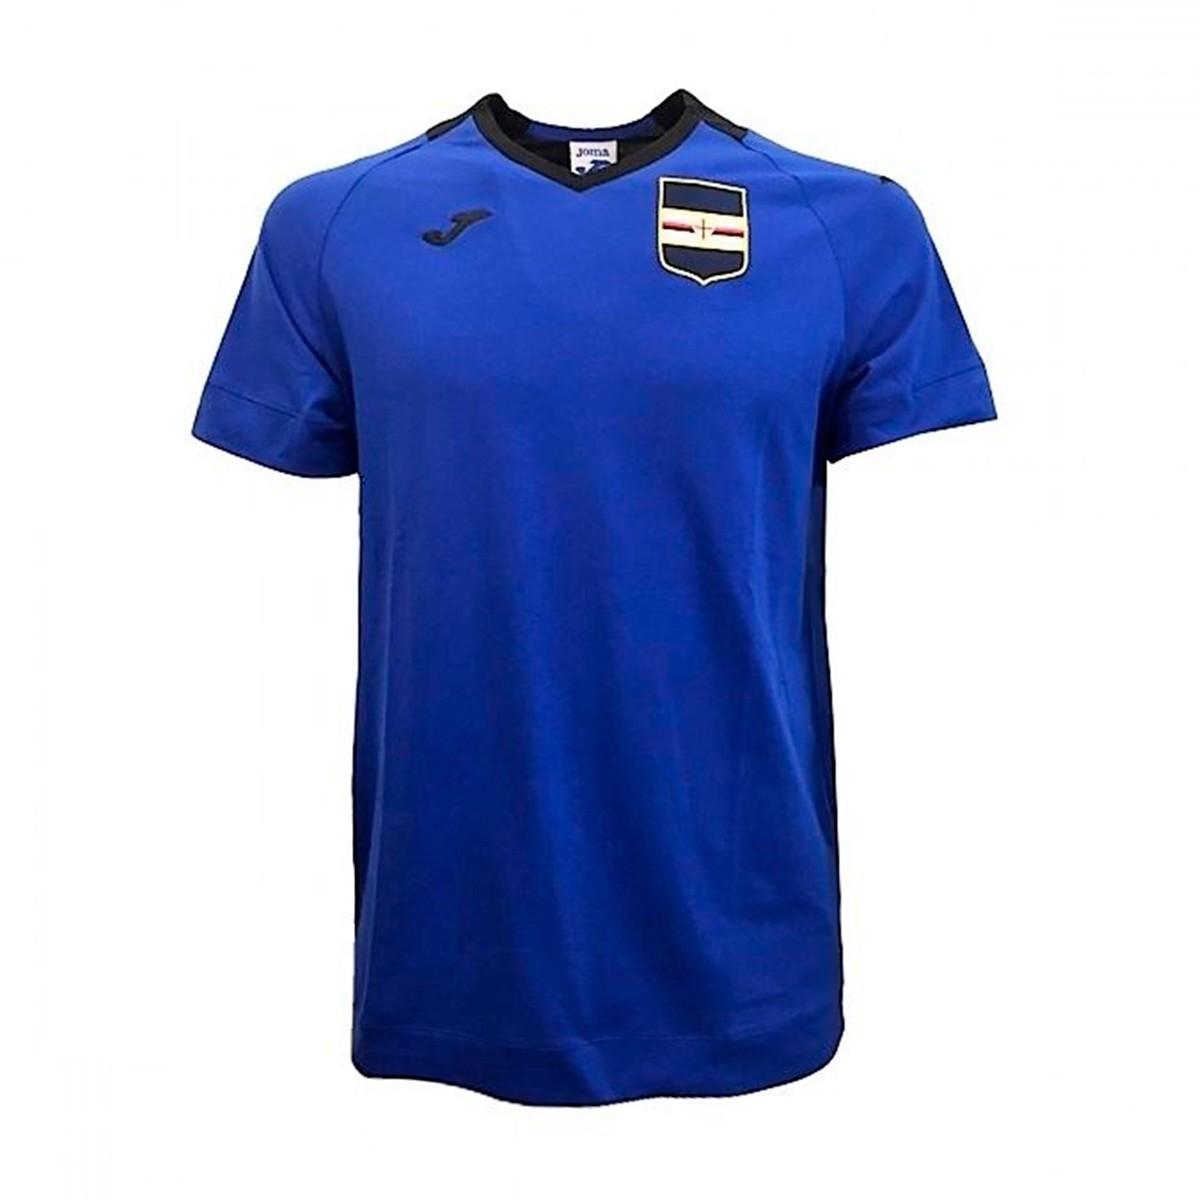 56803ec291 Camiseta Joma UC Sampdoria Paseo 2018-2019 Royal - Soloporteros es ahora  Fútbol Emotion